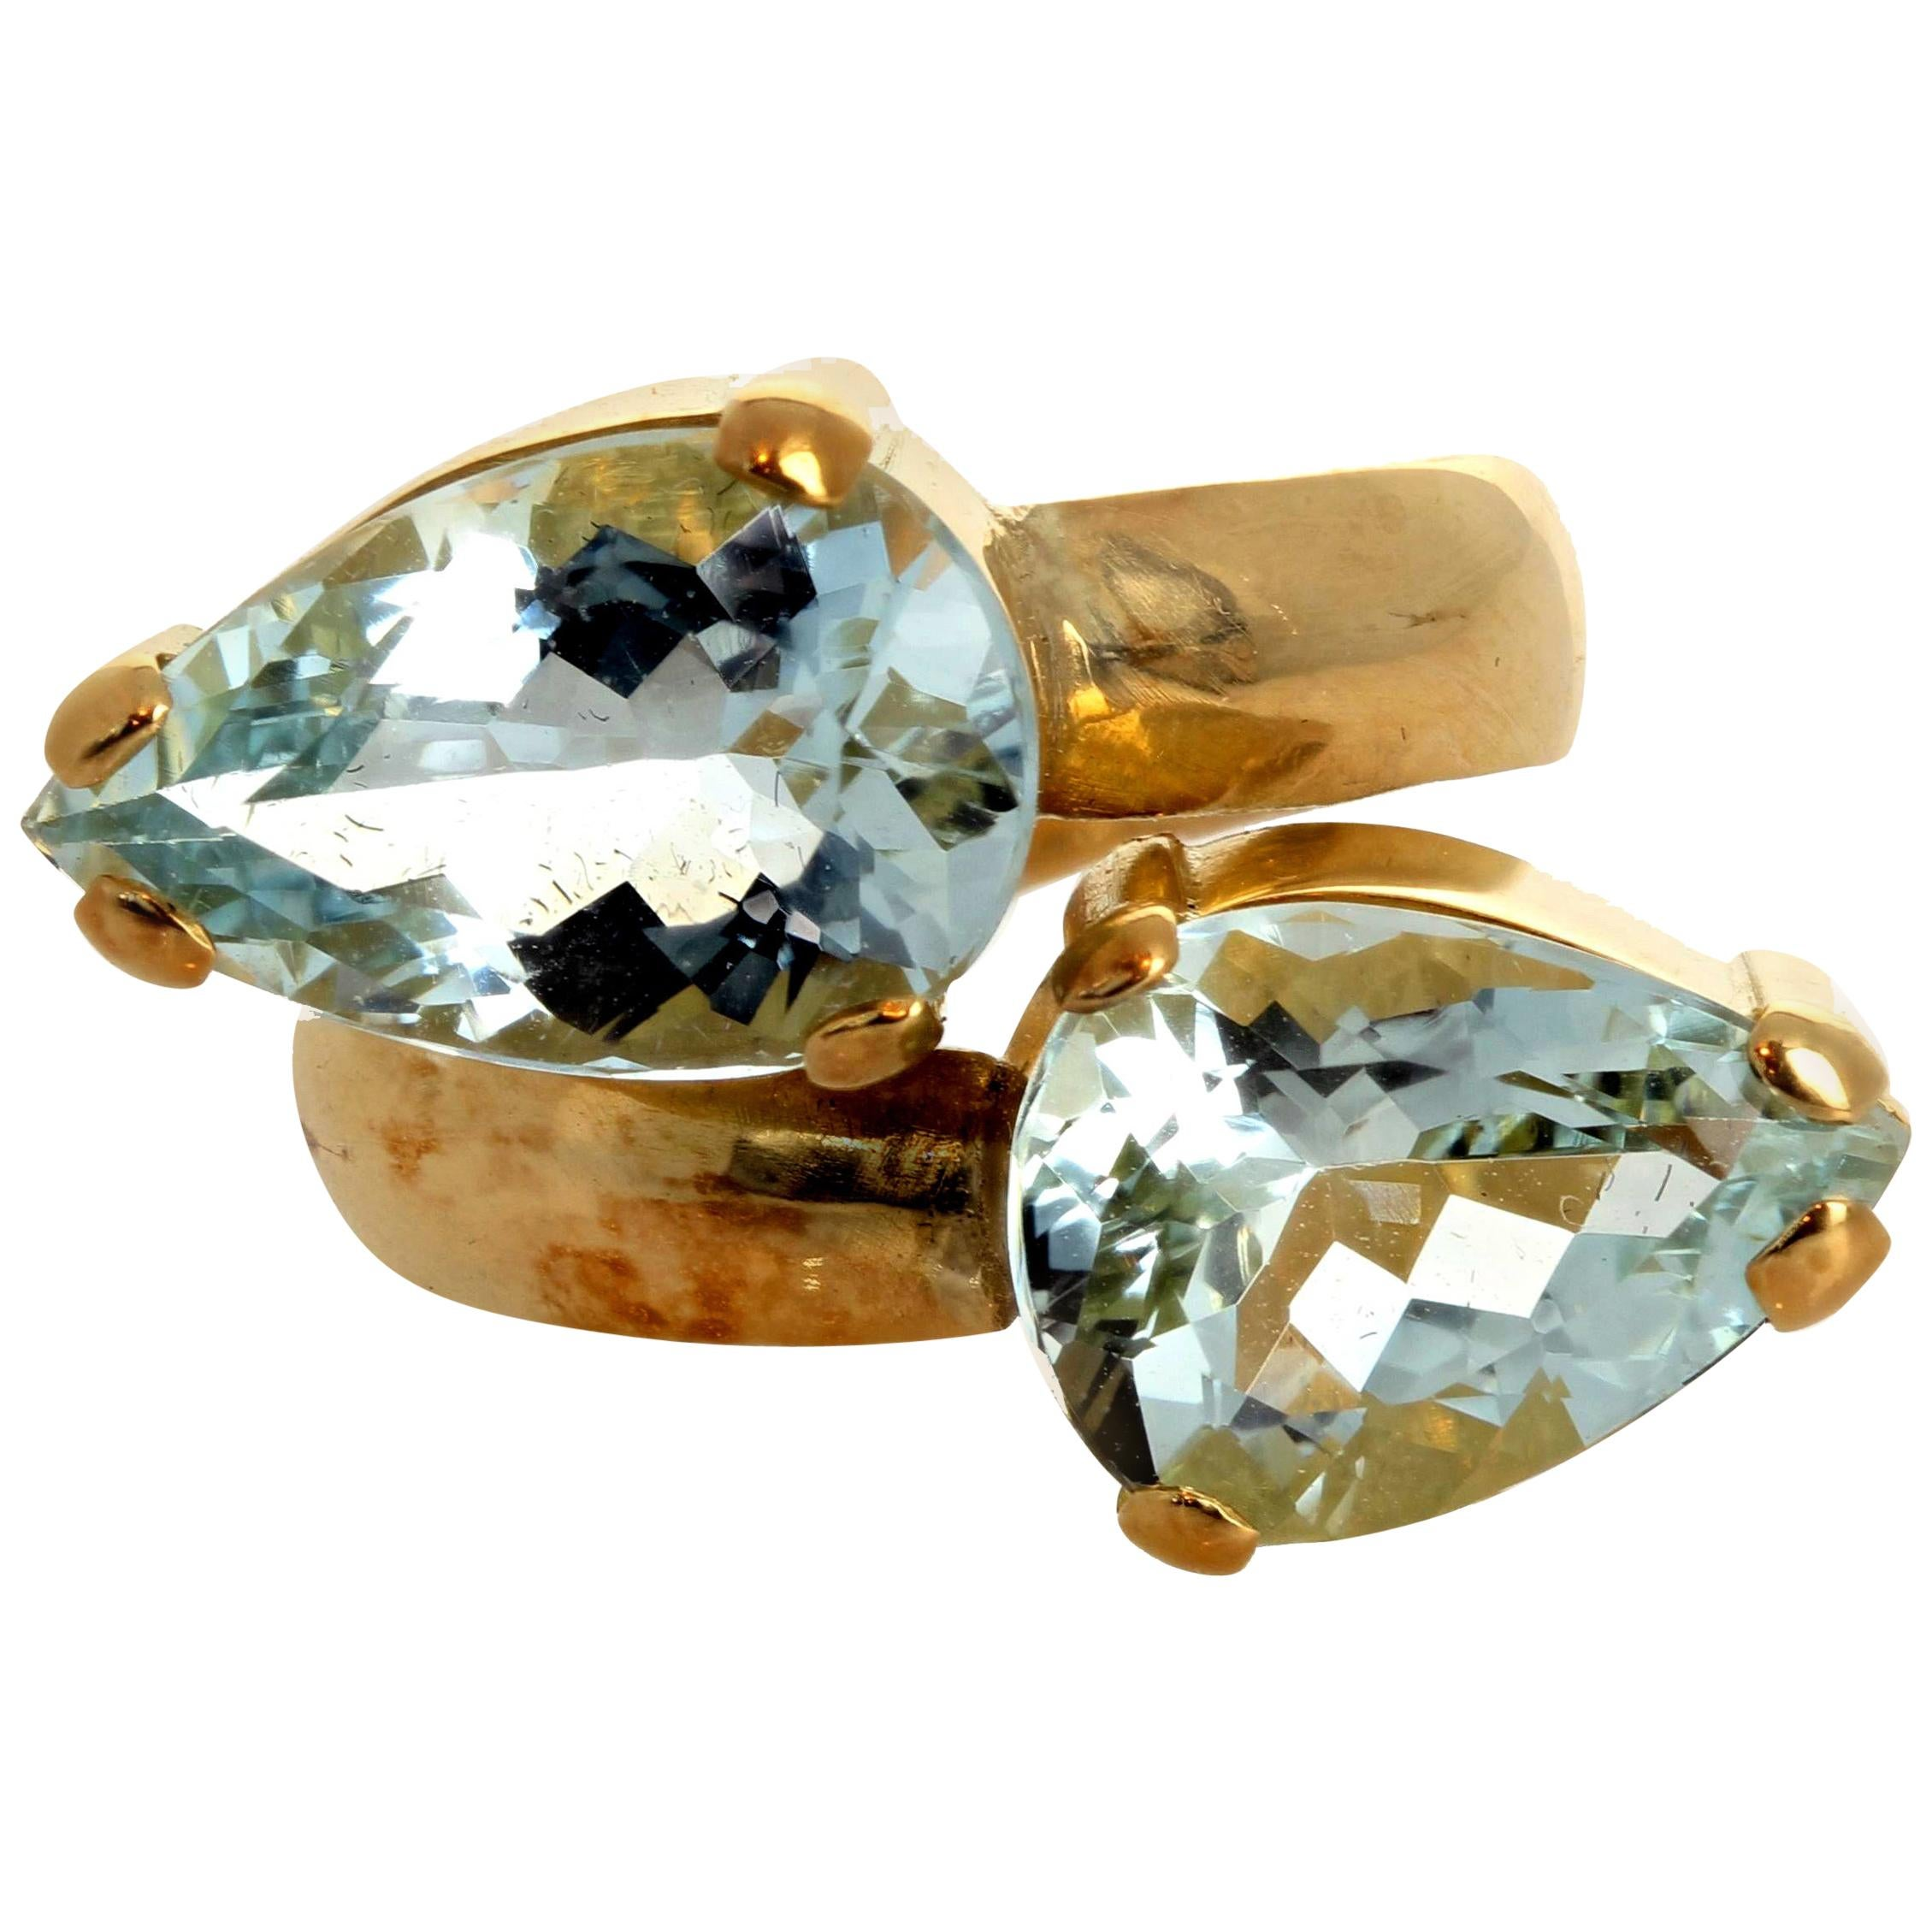 Gemjunky 2 Brilliant Sparkling 6 Ct Pear Cut Blue Aquamarines in 18k Gold Ring